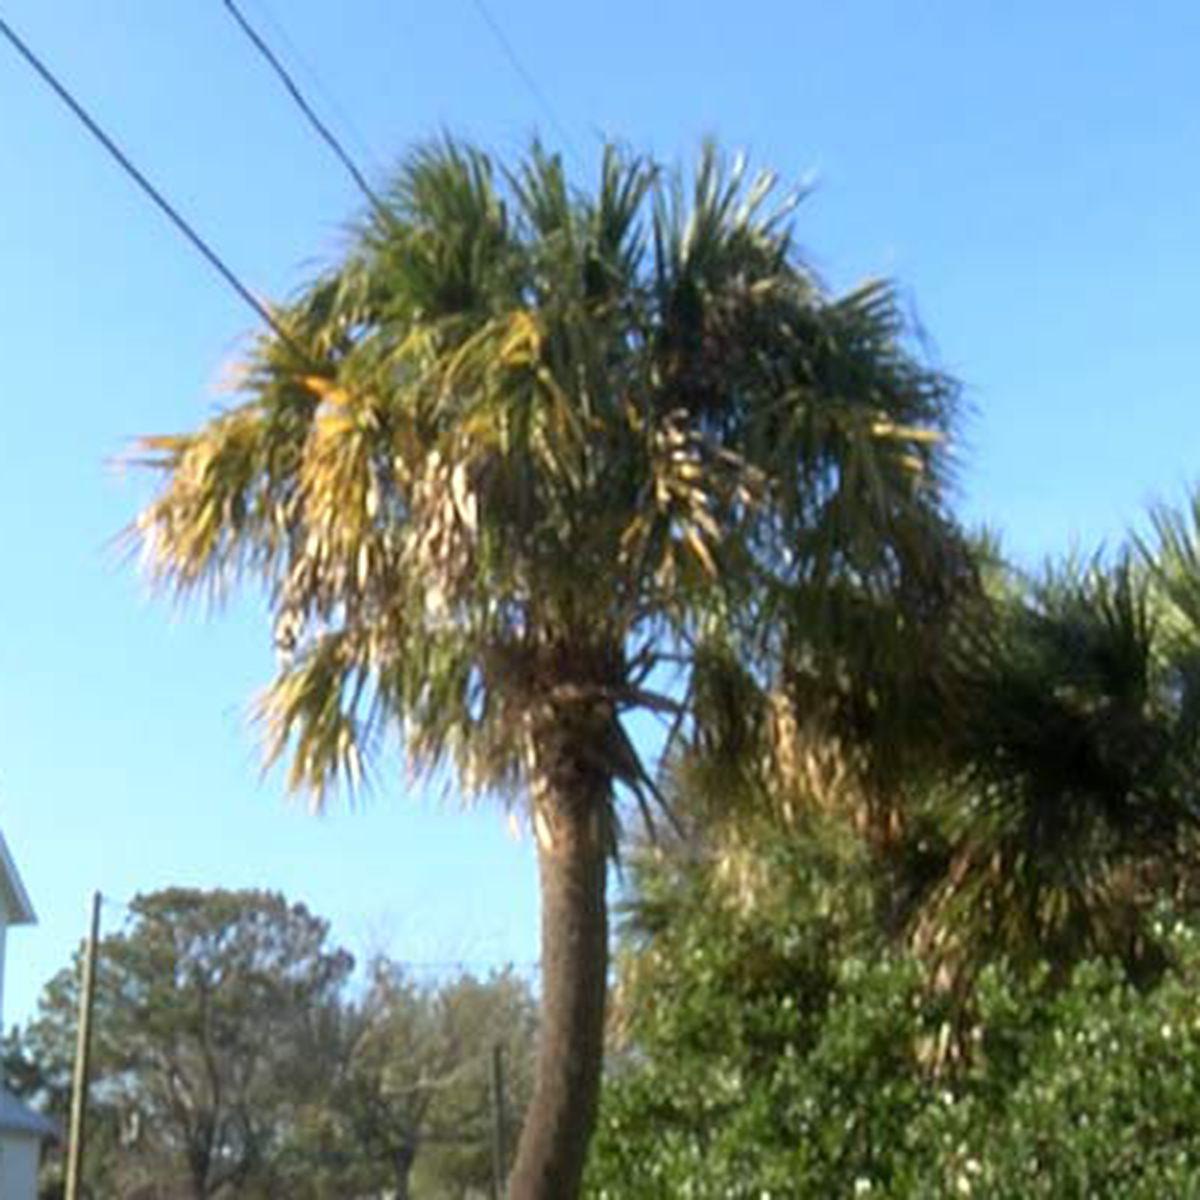 Dominion Energy suspends plan to cut trees on Sullivan's Island